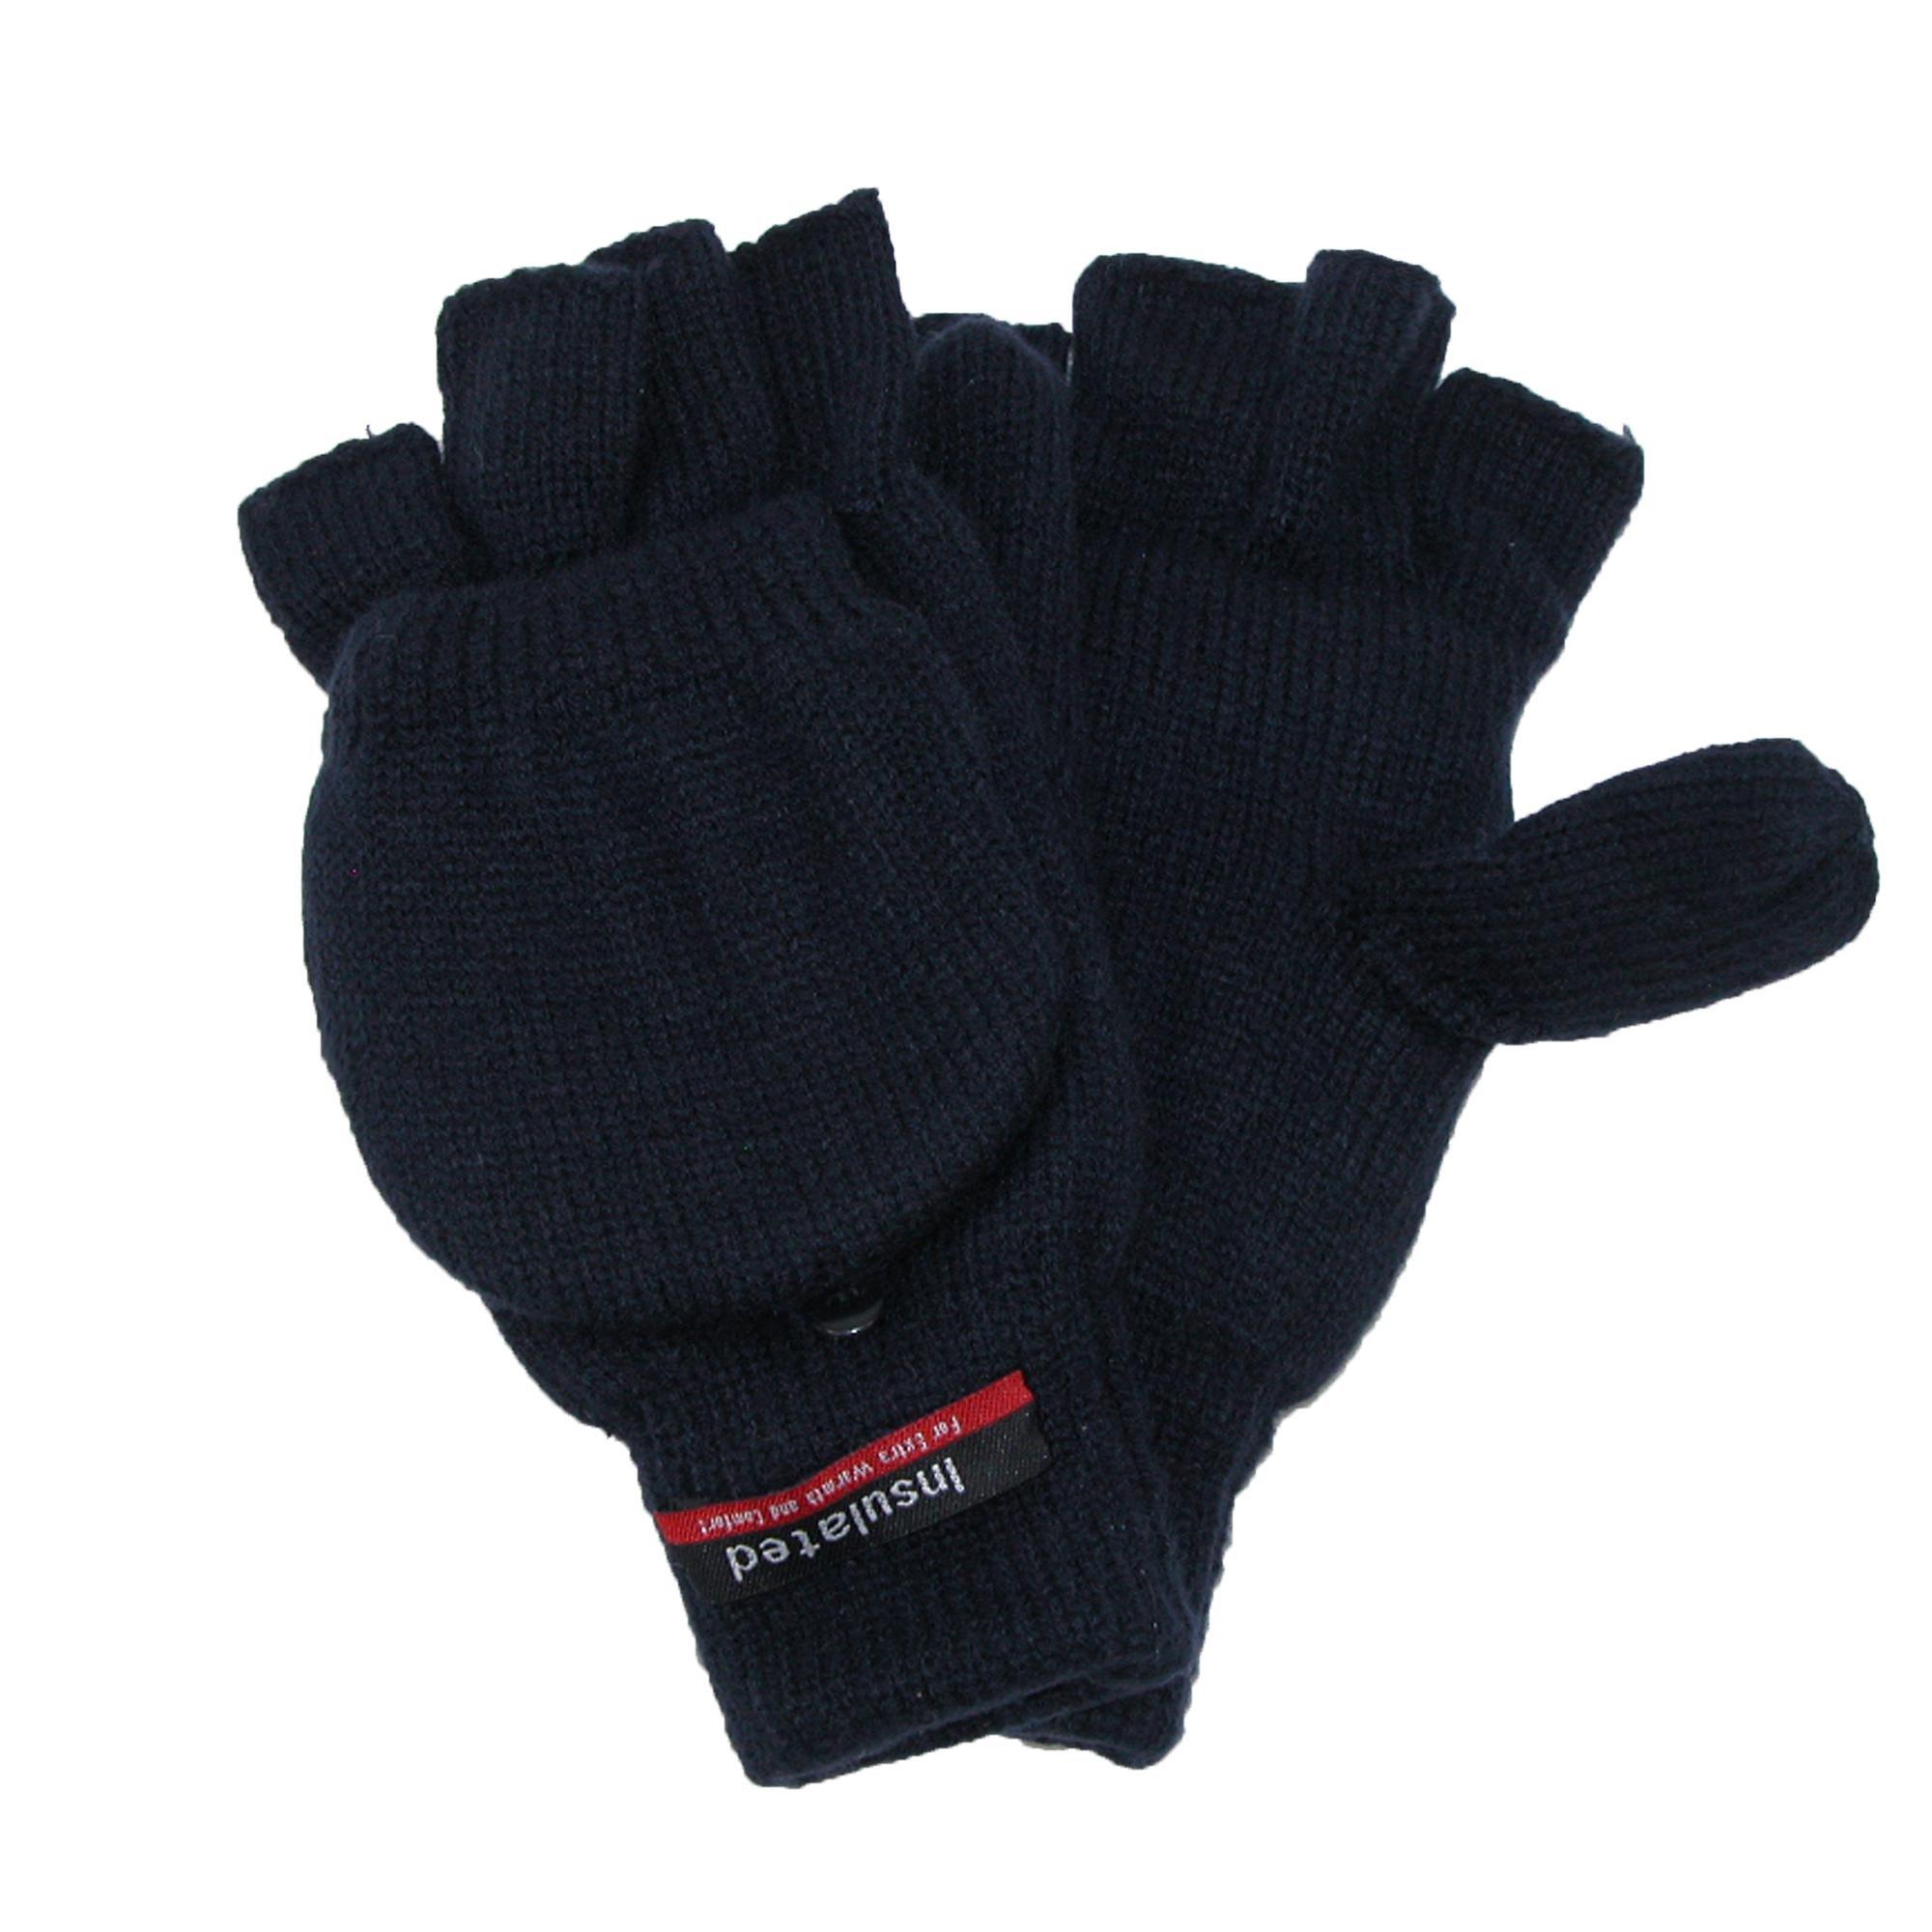 CTM Men's Knit Flip Top Insulated Gloves, Navy